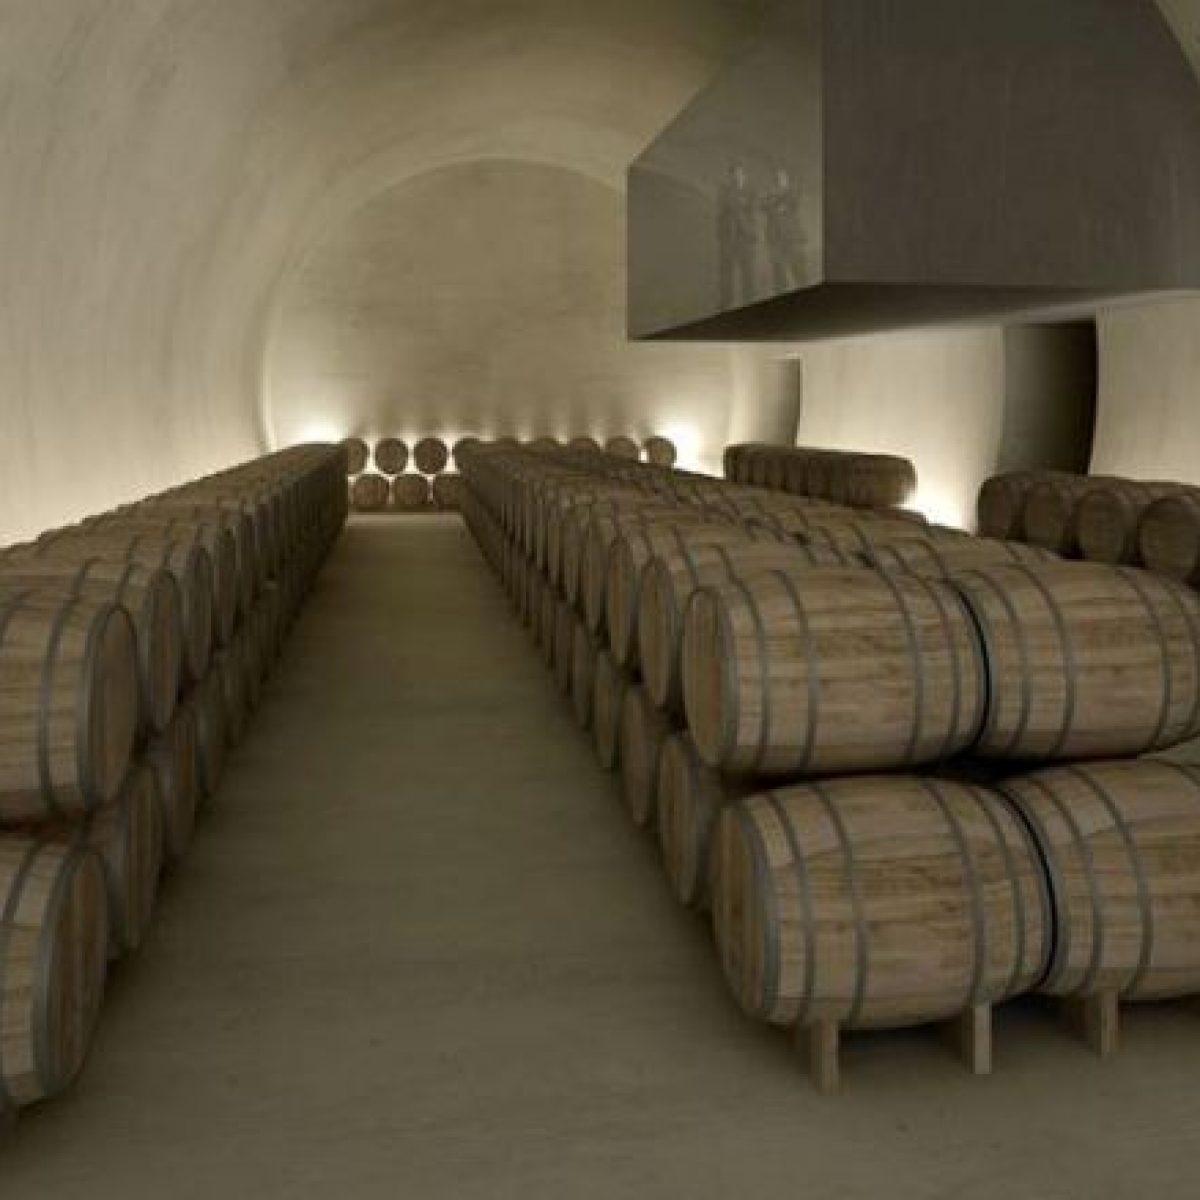 Quinta do Freixo Winery